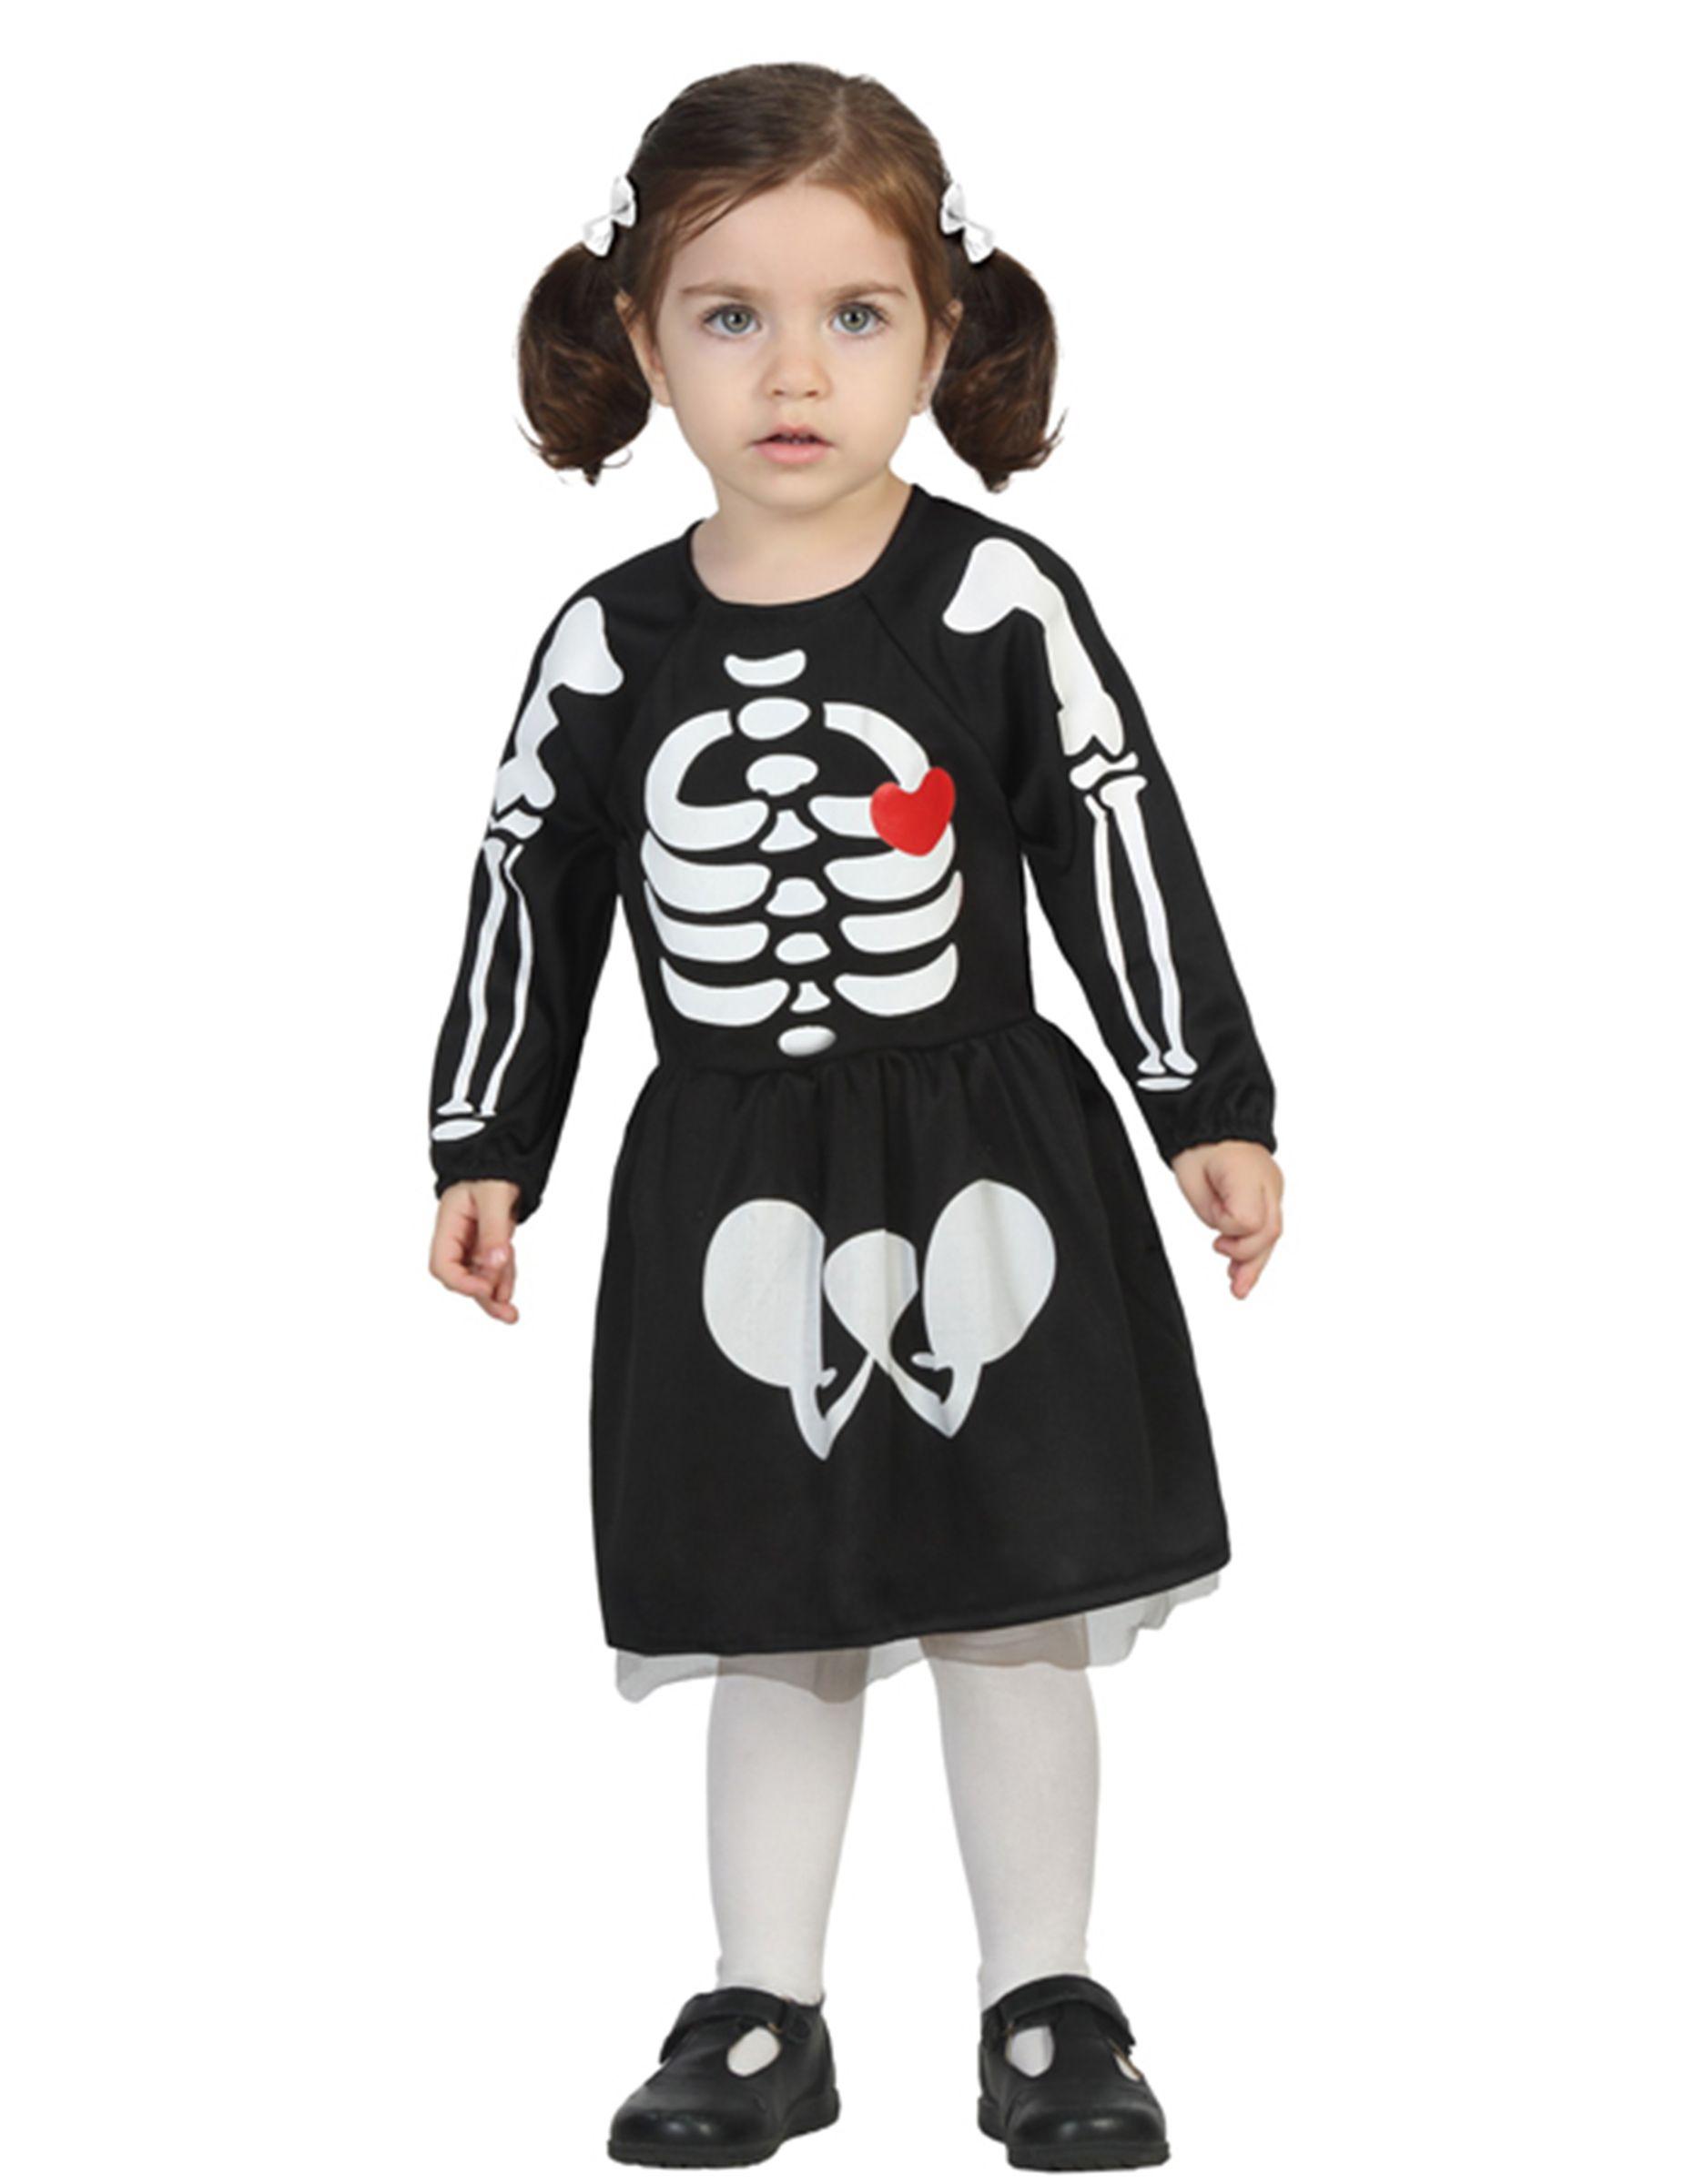 disfraz de esqueleto beb nia halloween este vestido para nia es de esqueleto